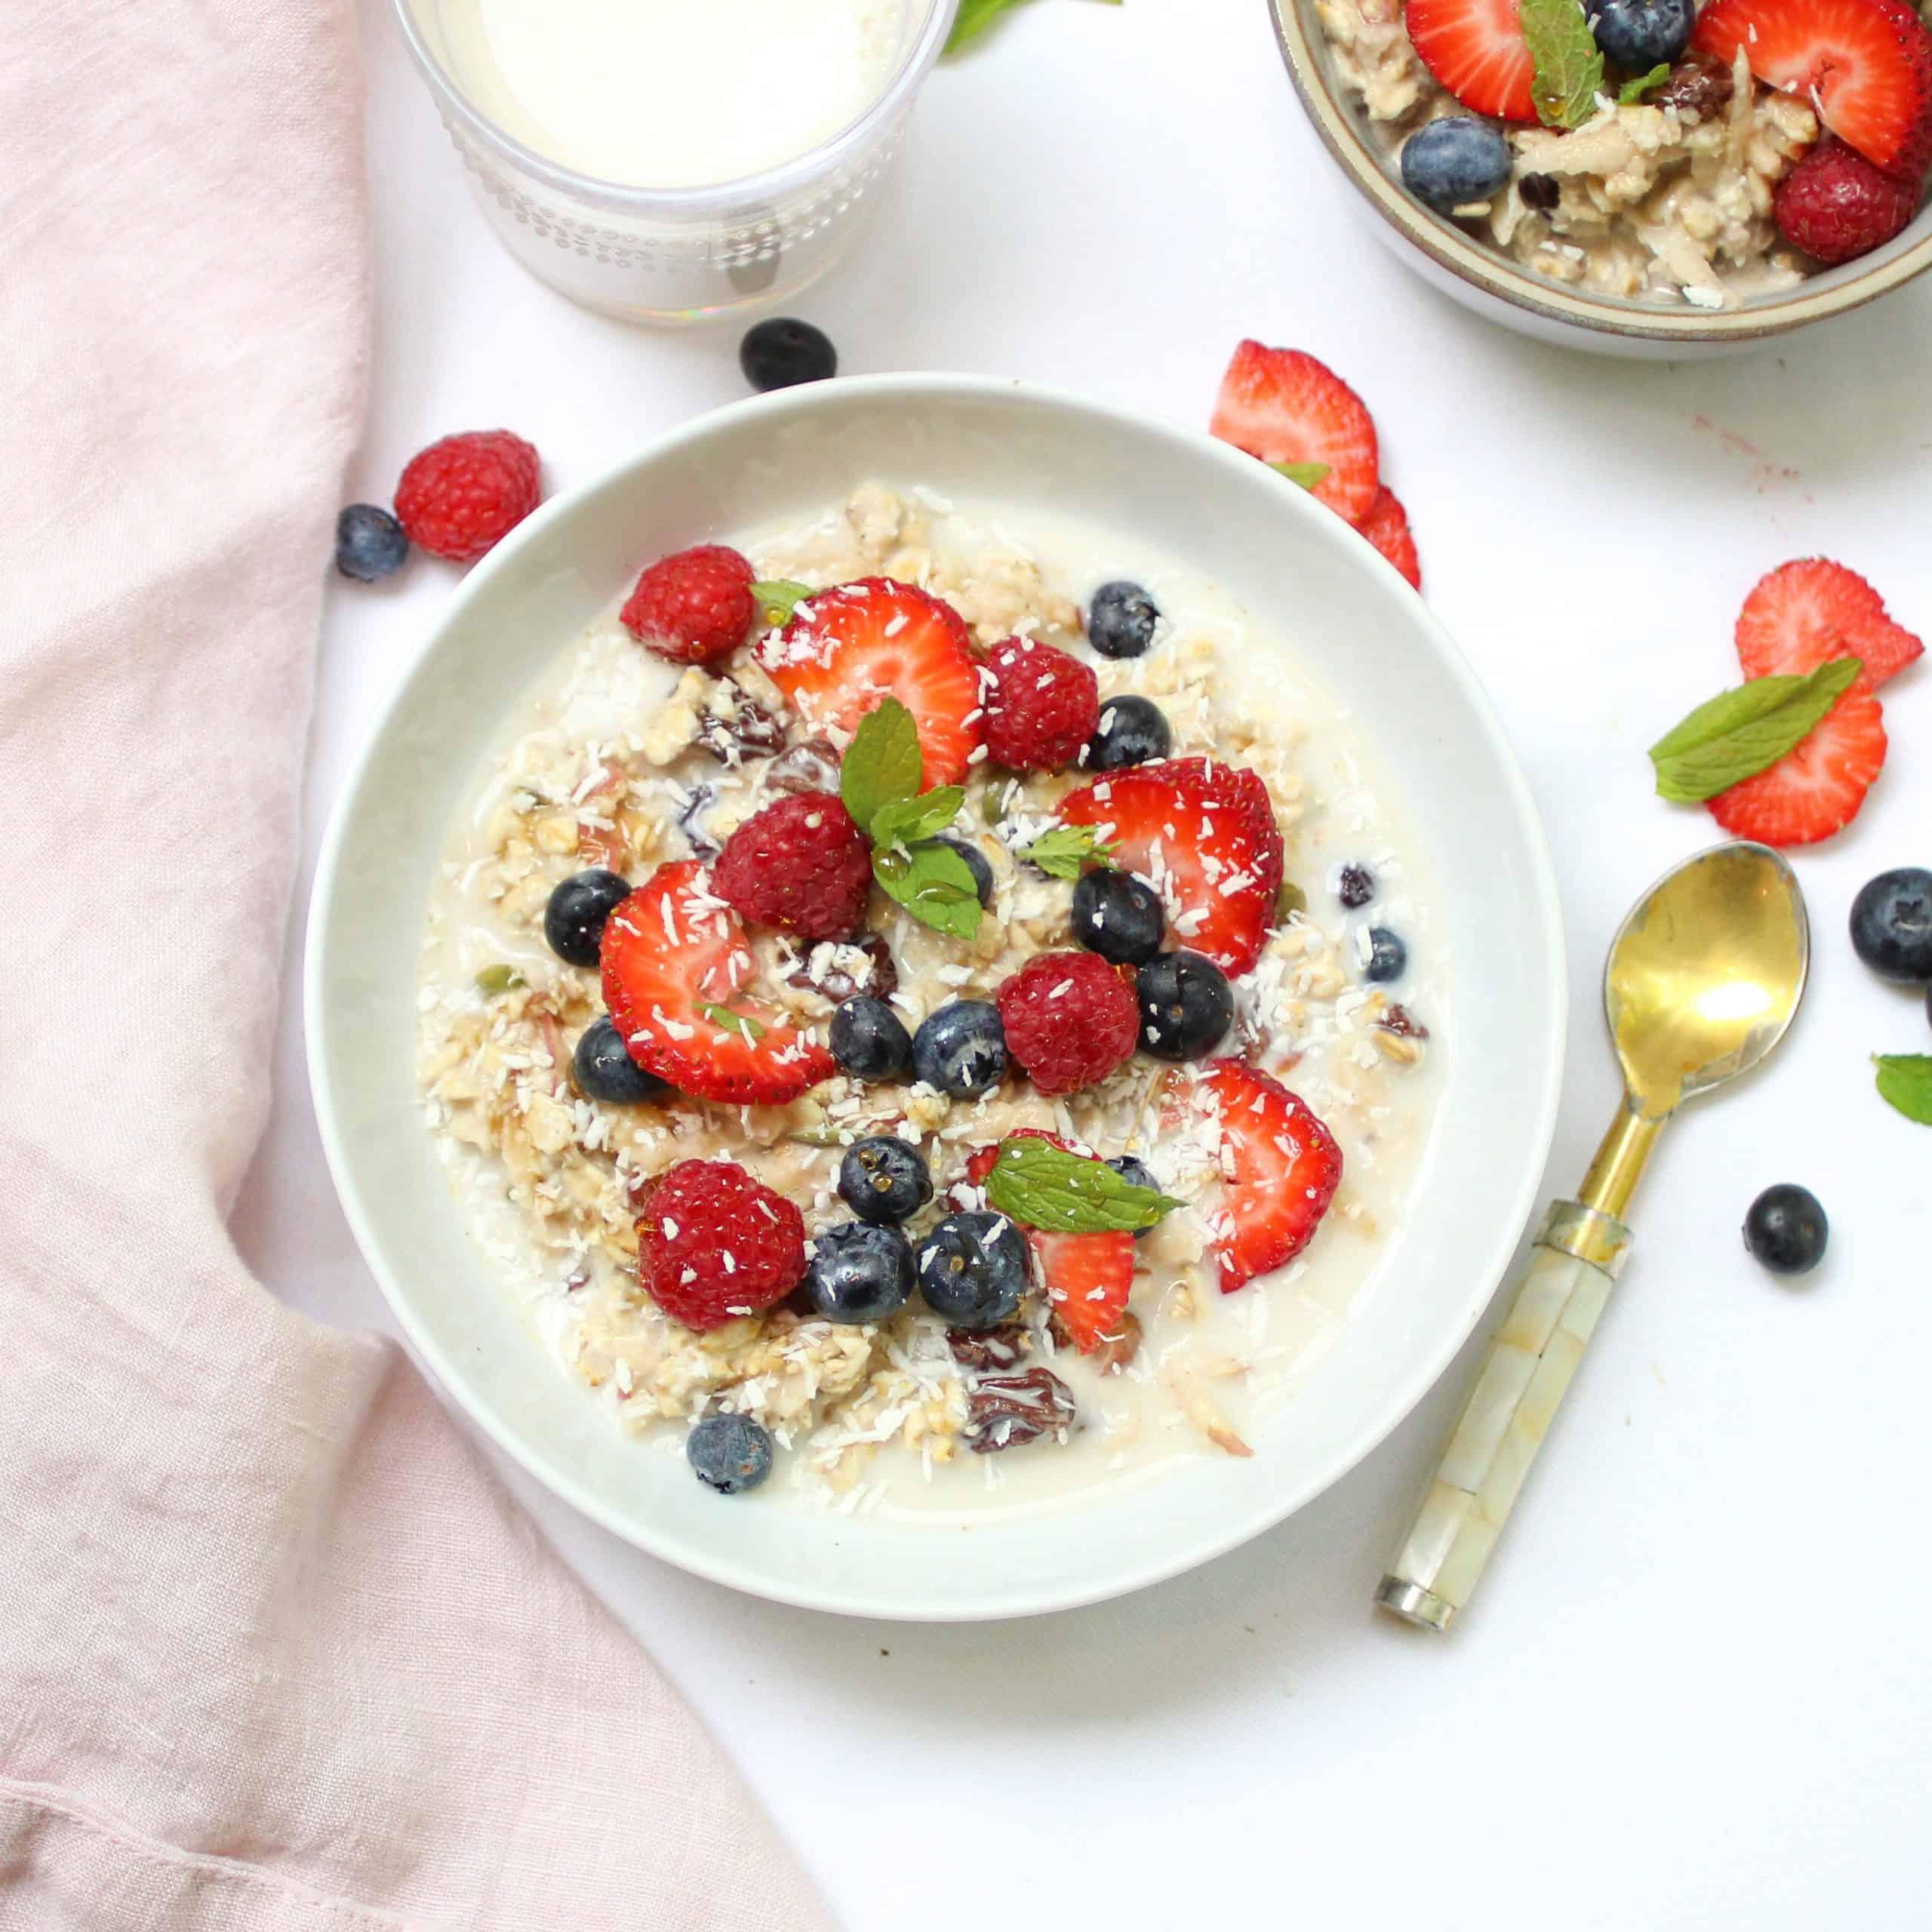 a bowl of vegan bircher muesli and berries